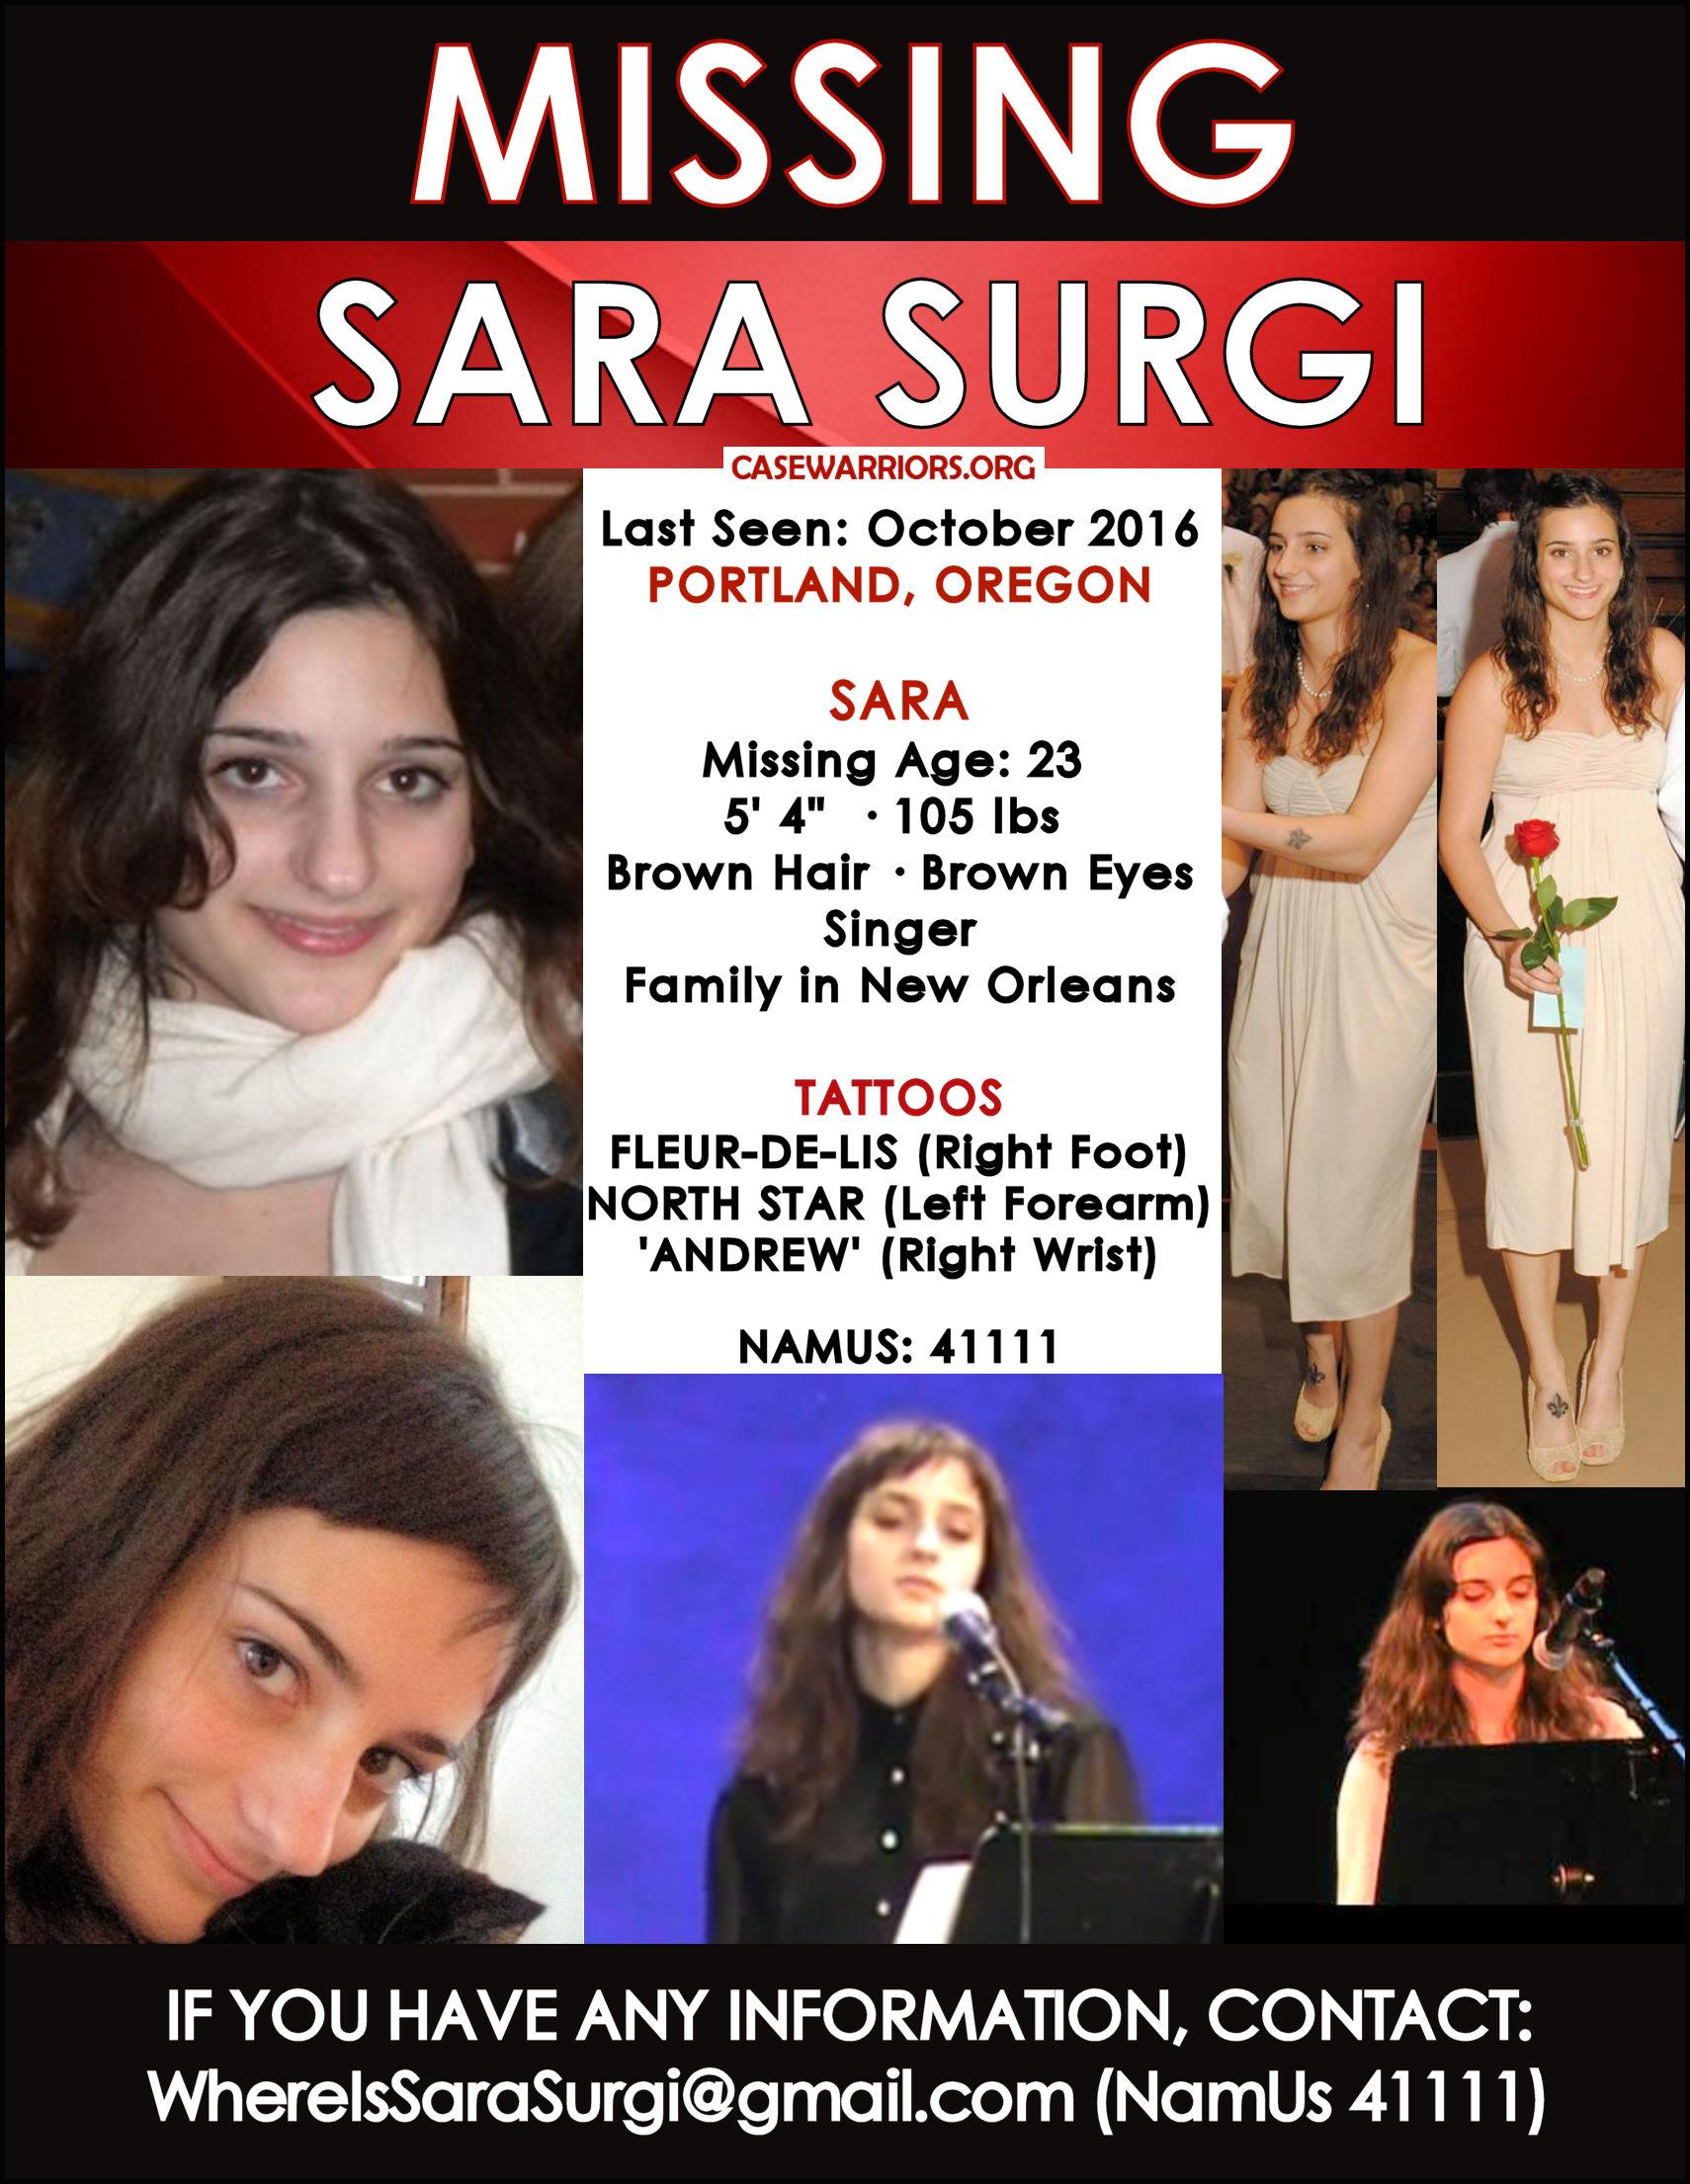 SARA SURGI